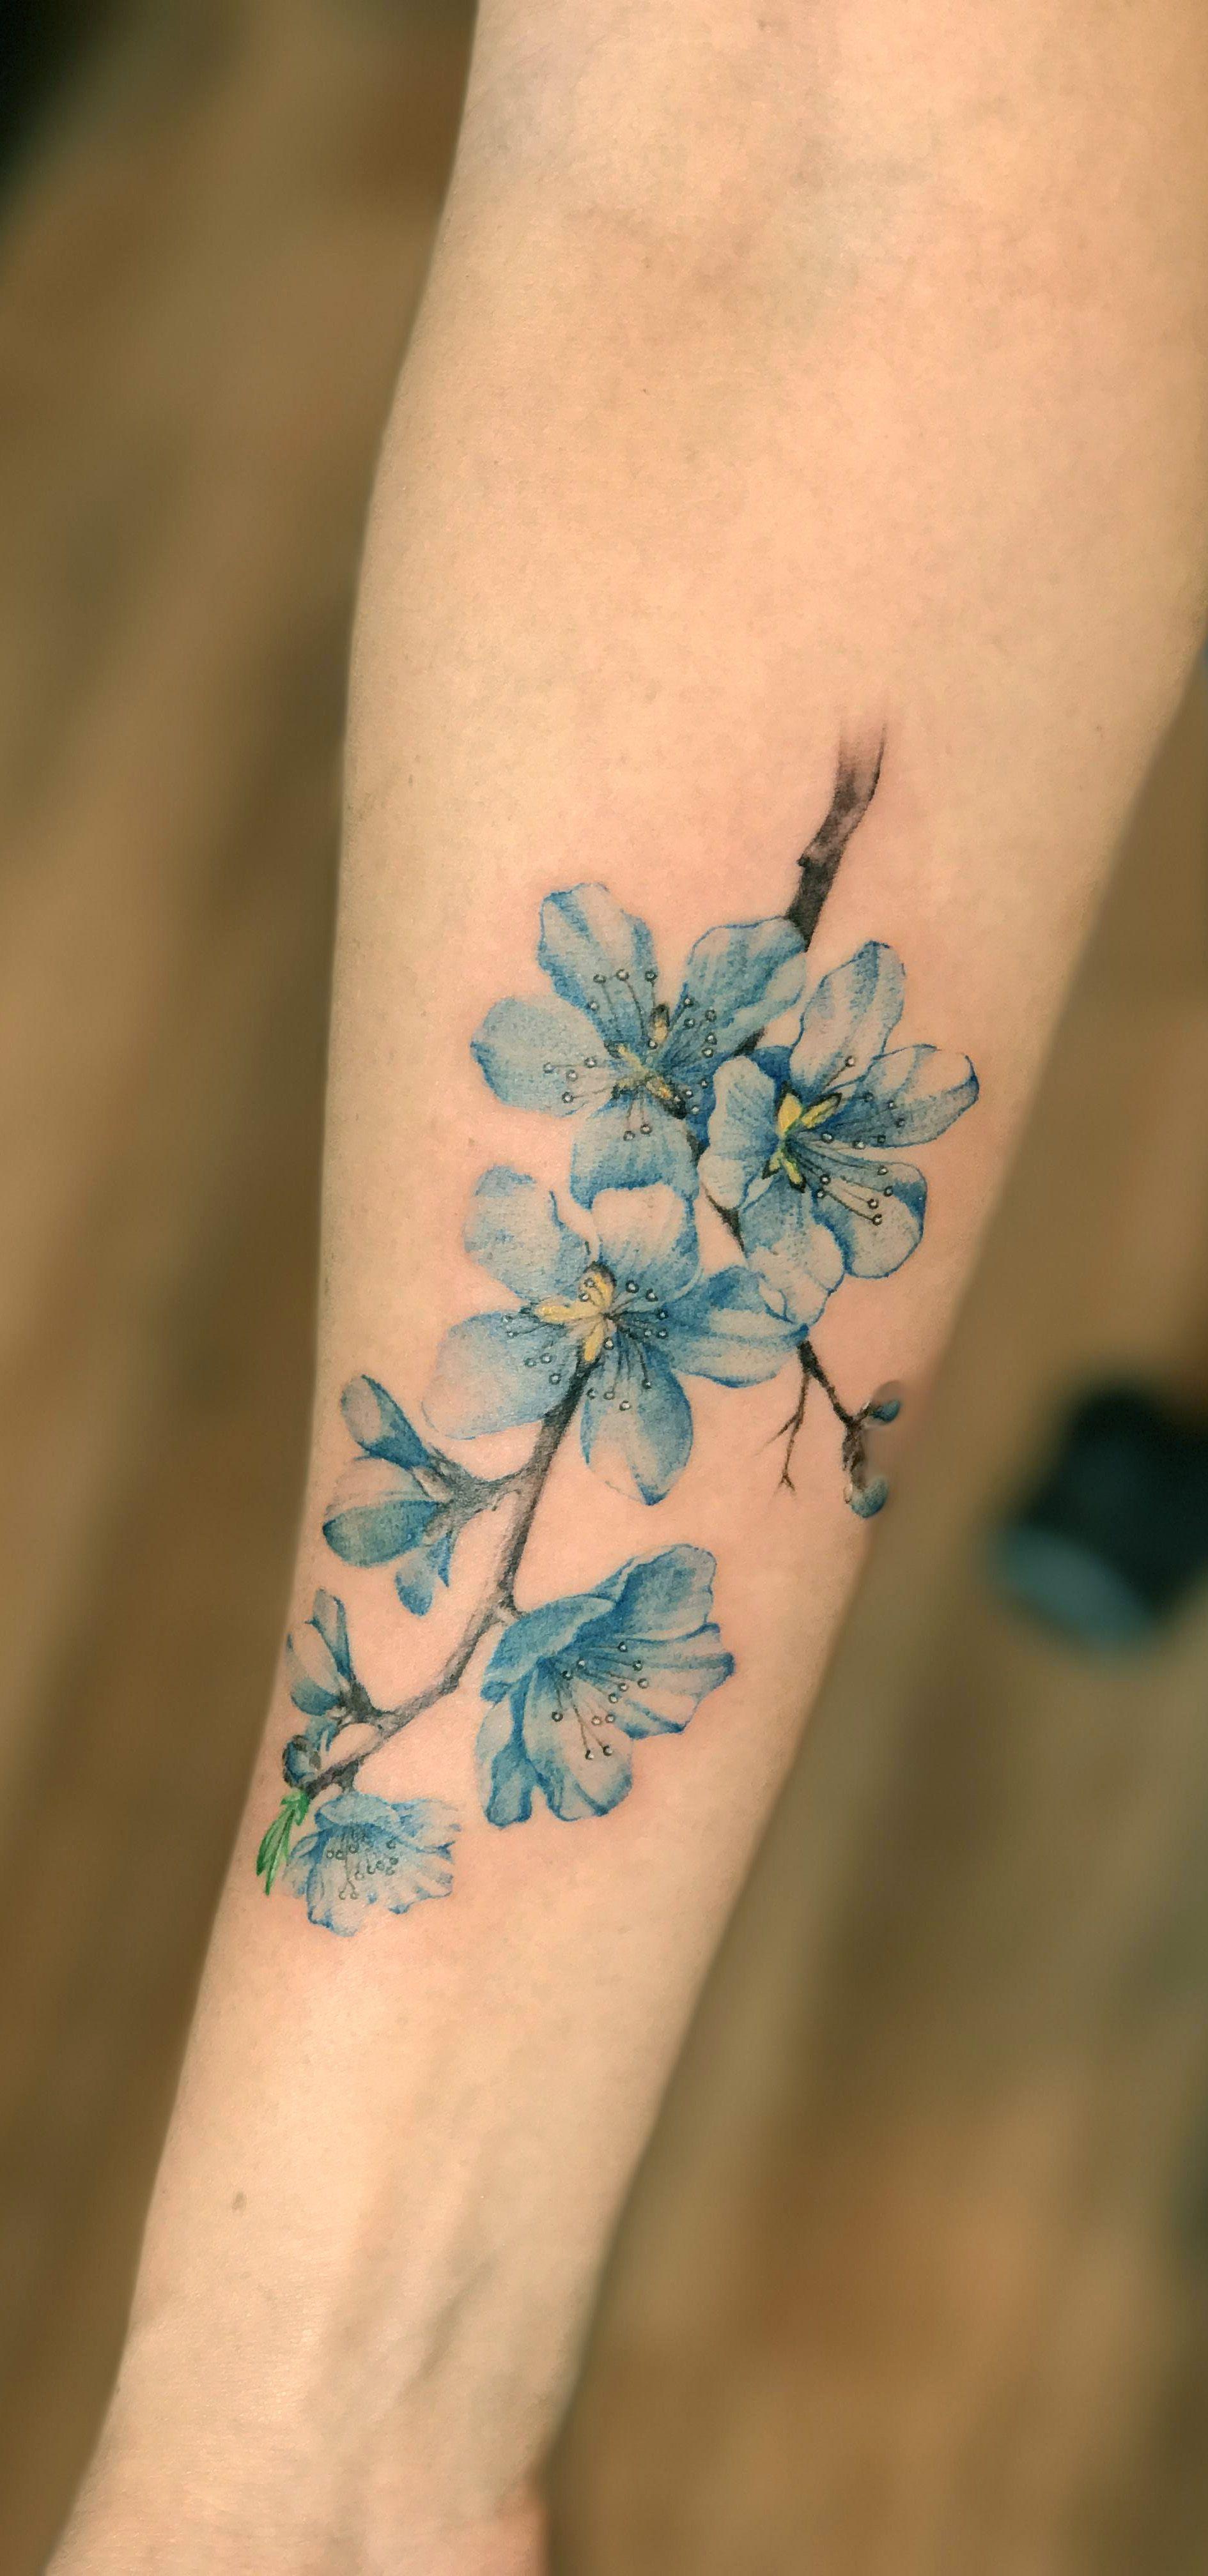 Blue Flowers Tattoo By Jay Shin Black Fish Tattoo Nyc Flowers